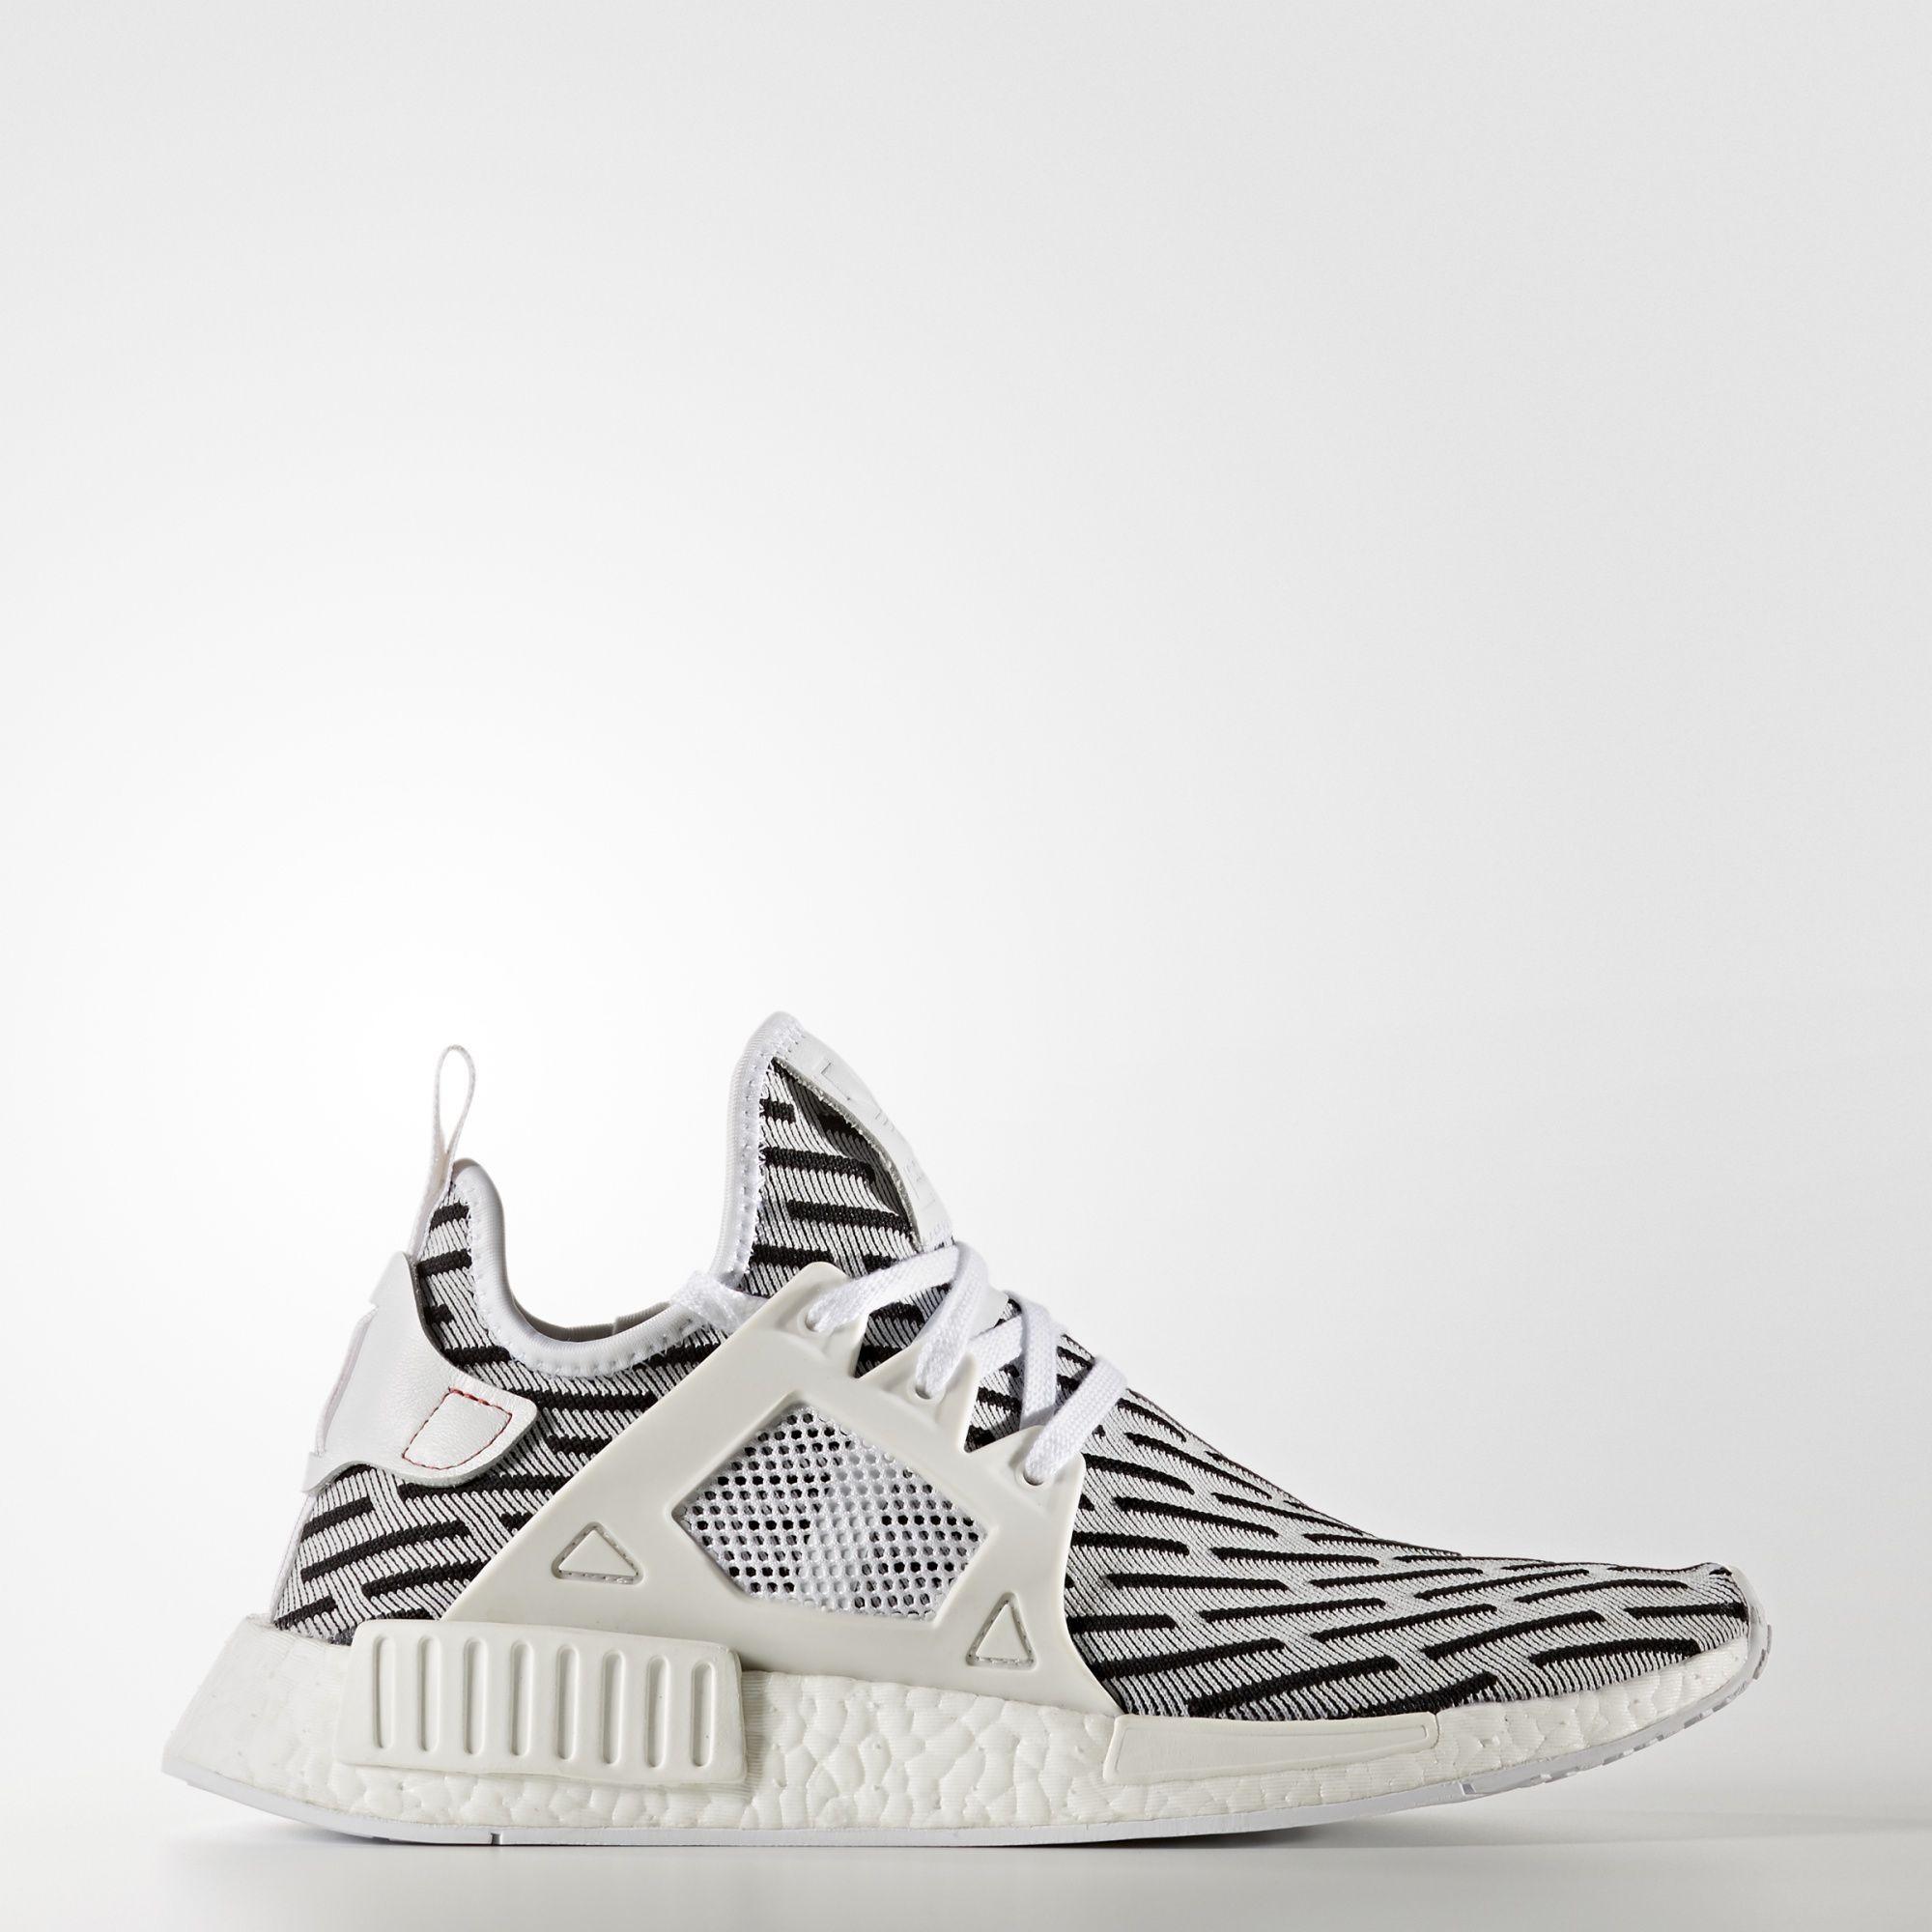 cheap adidas originals nmd xr1 primeknit shoes white